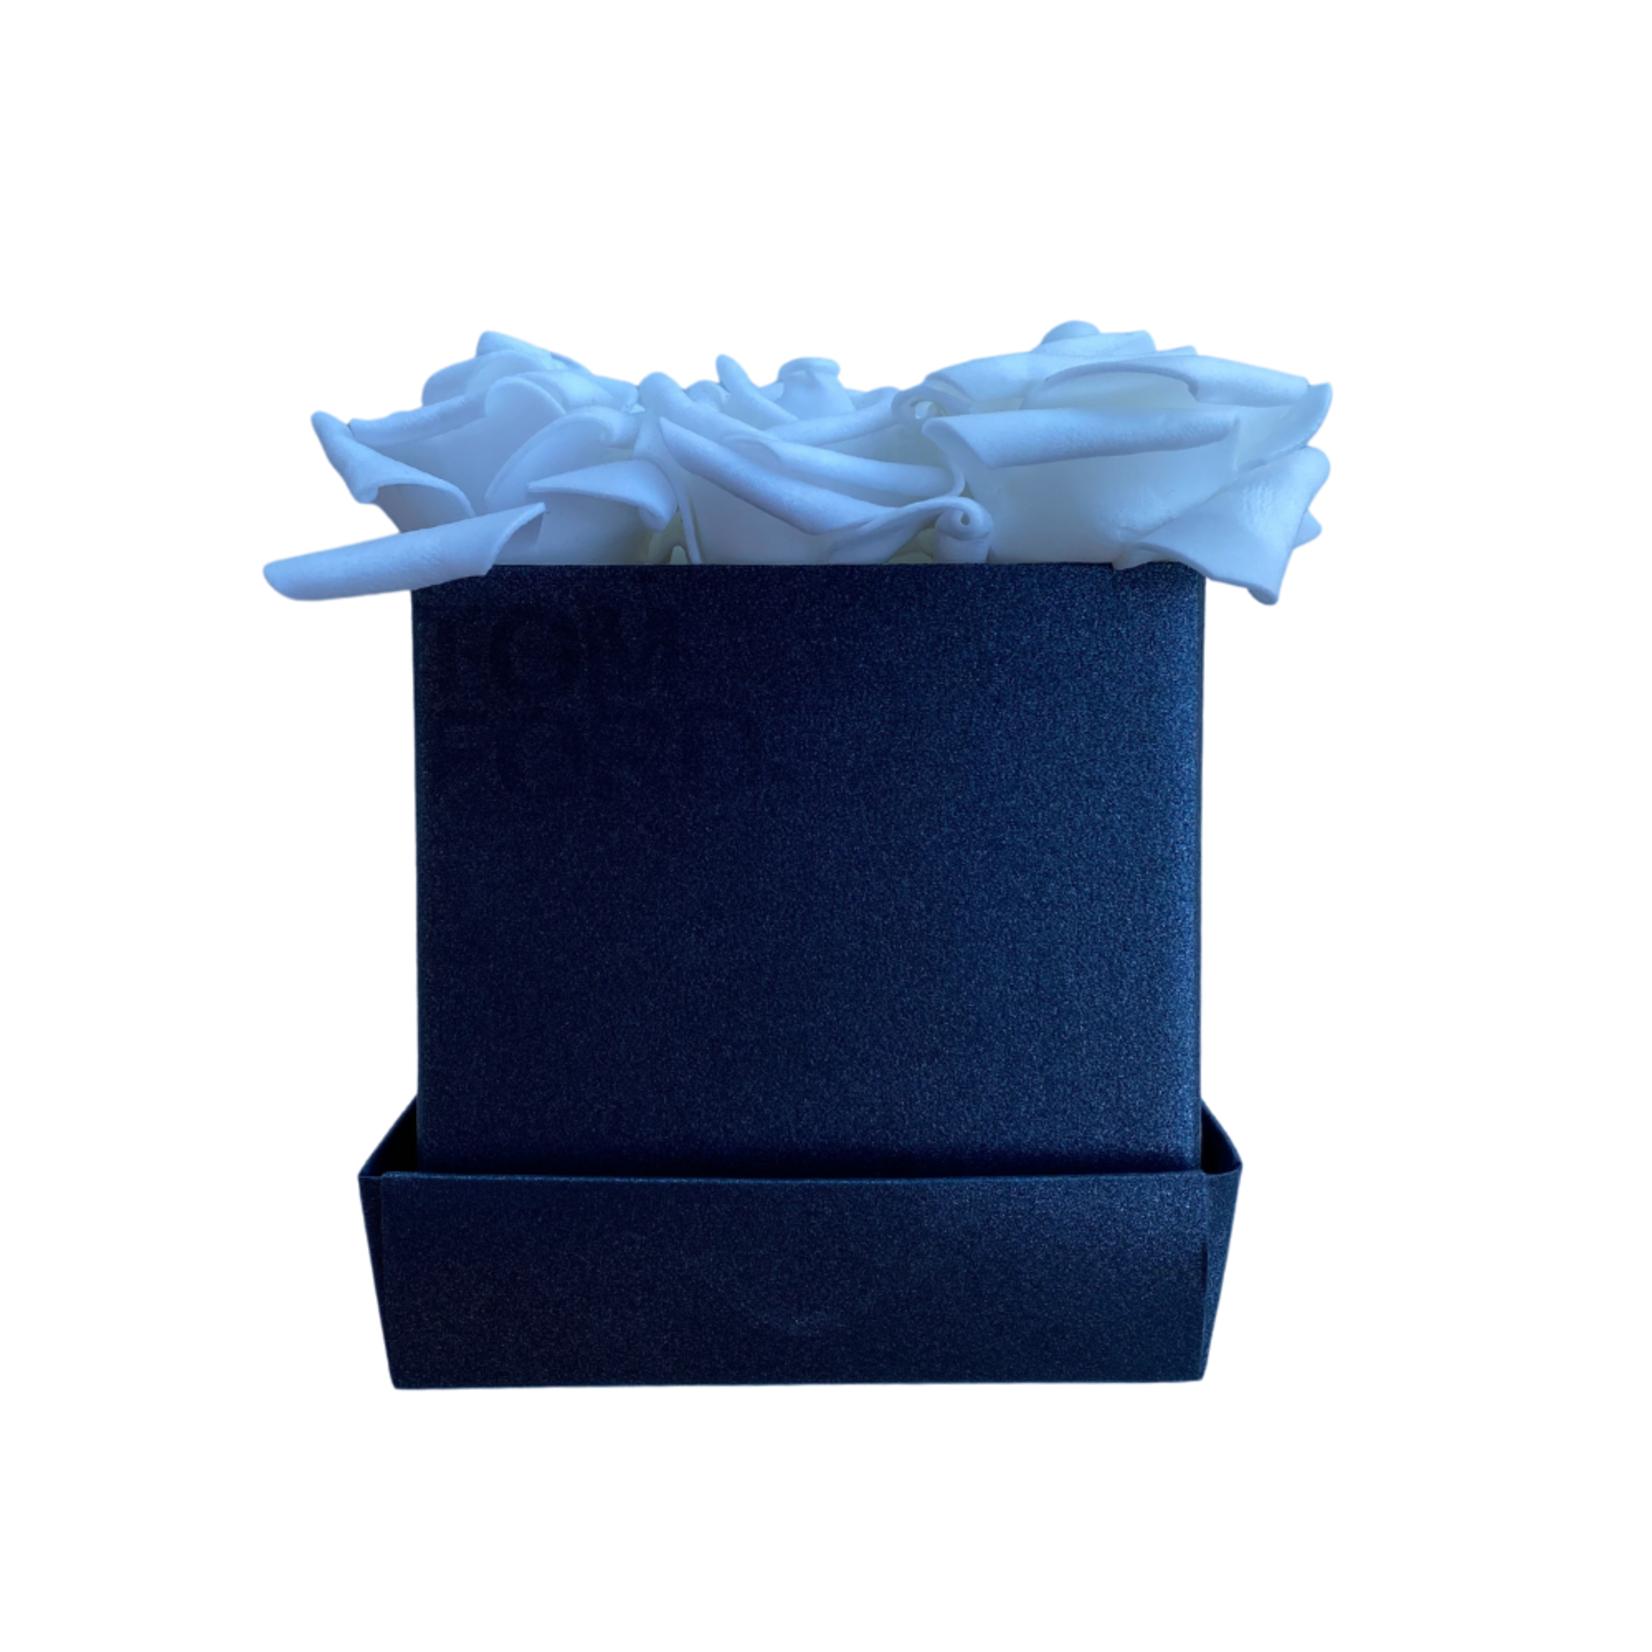 Tom Ford Flower Box Decor